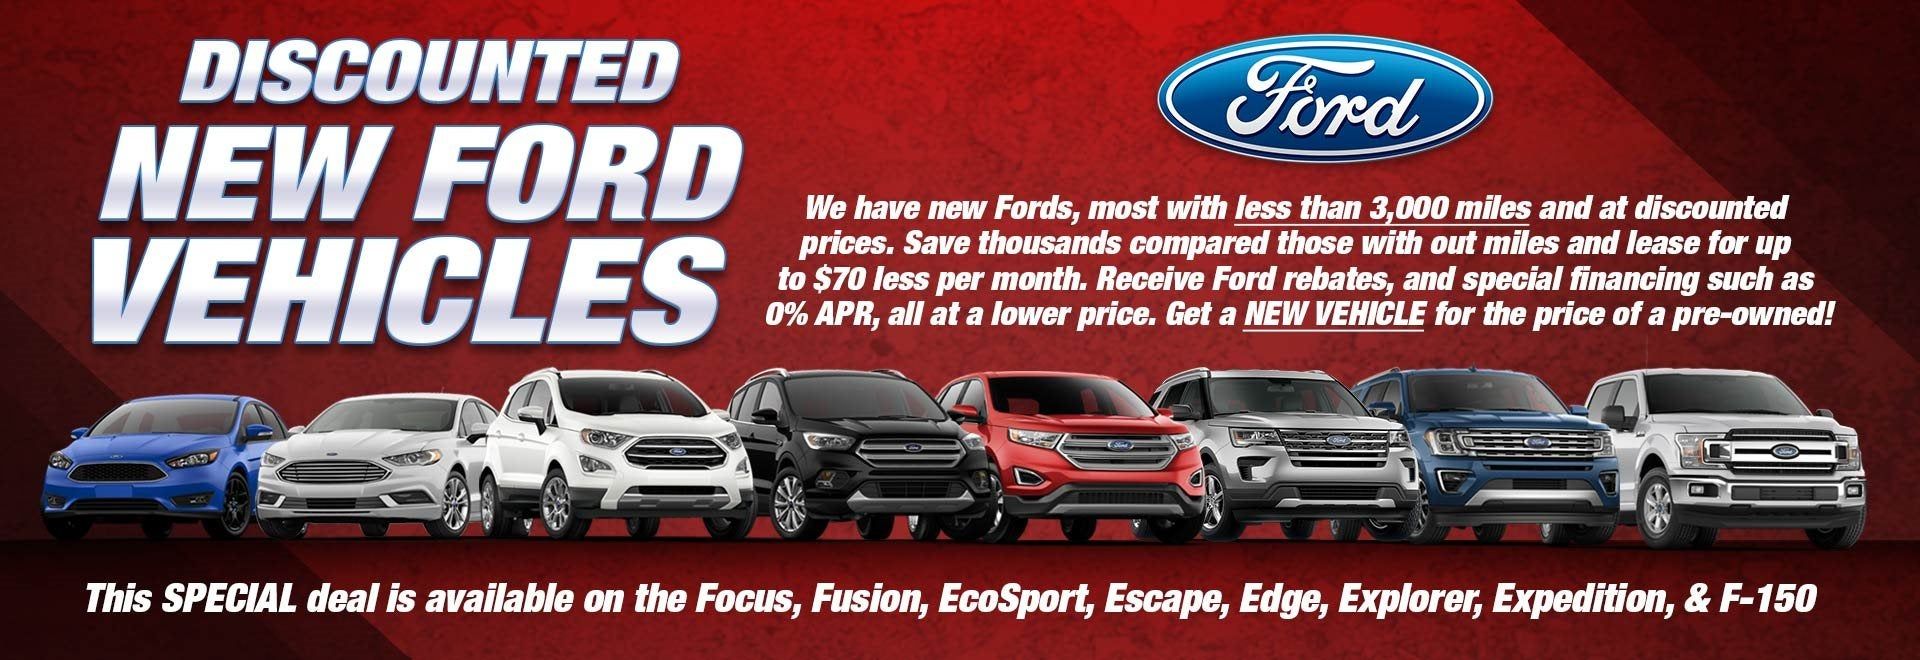 Ford Dealer in East Greenwich, RI | Used Cars East Greenwich | Flood